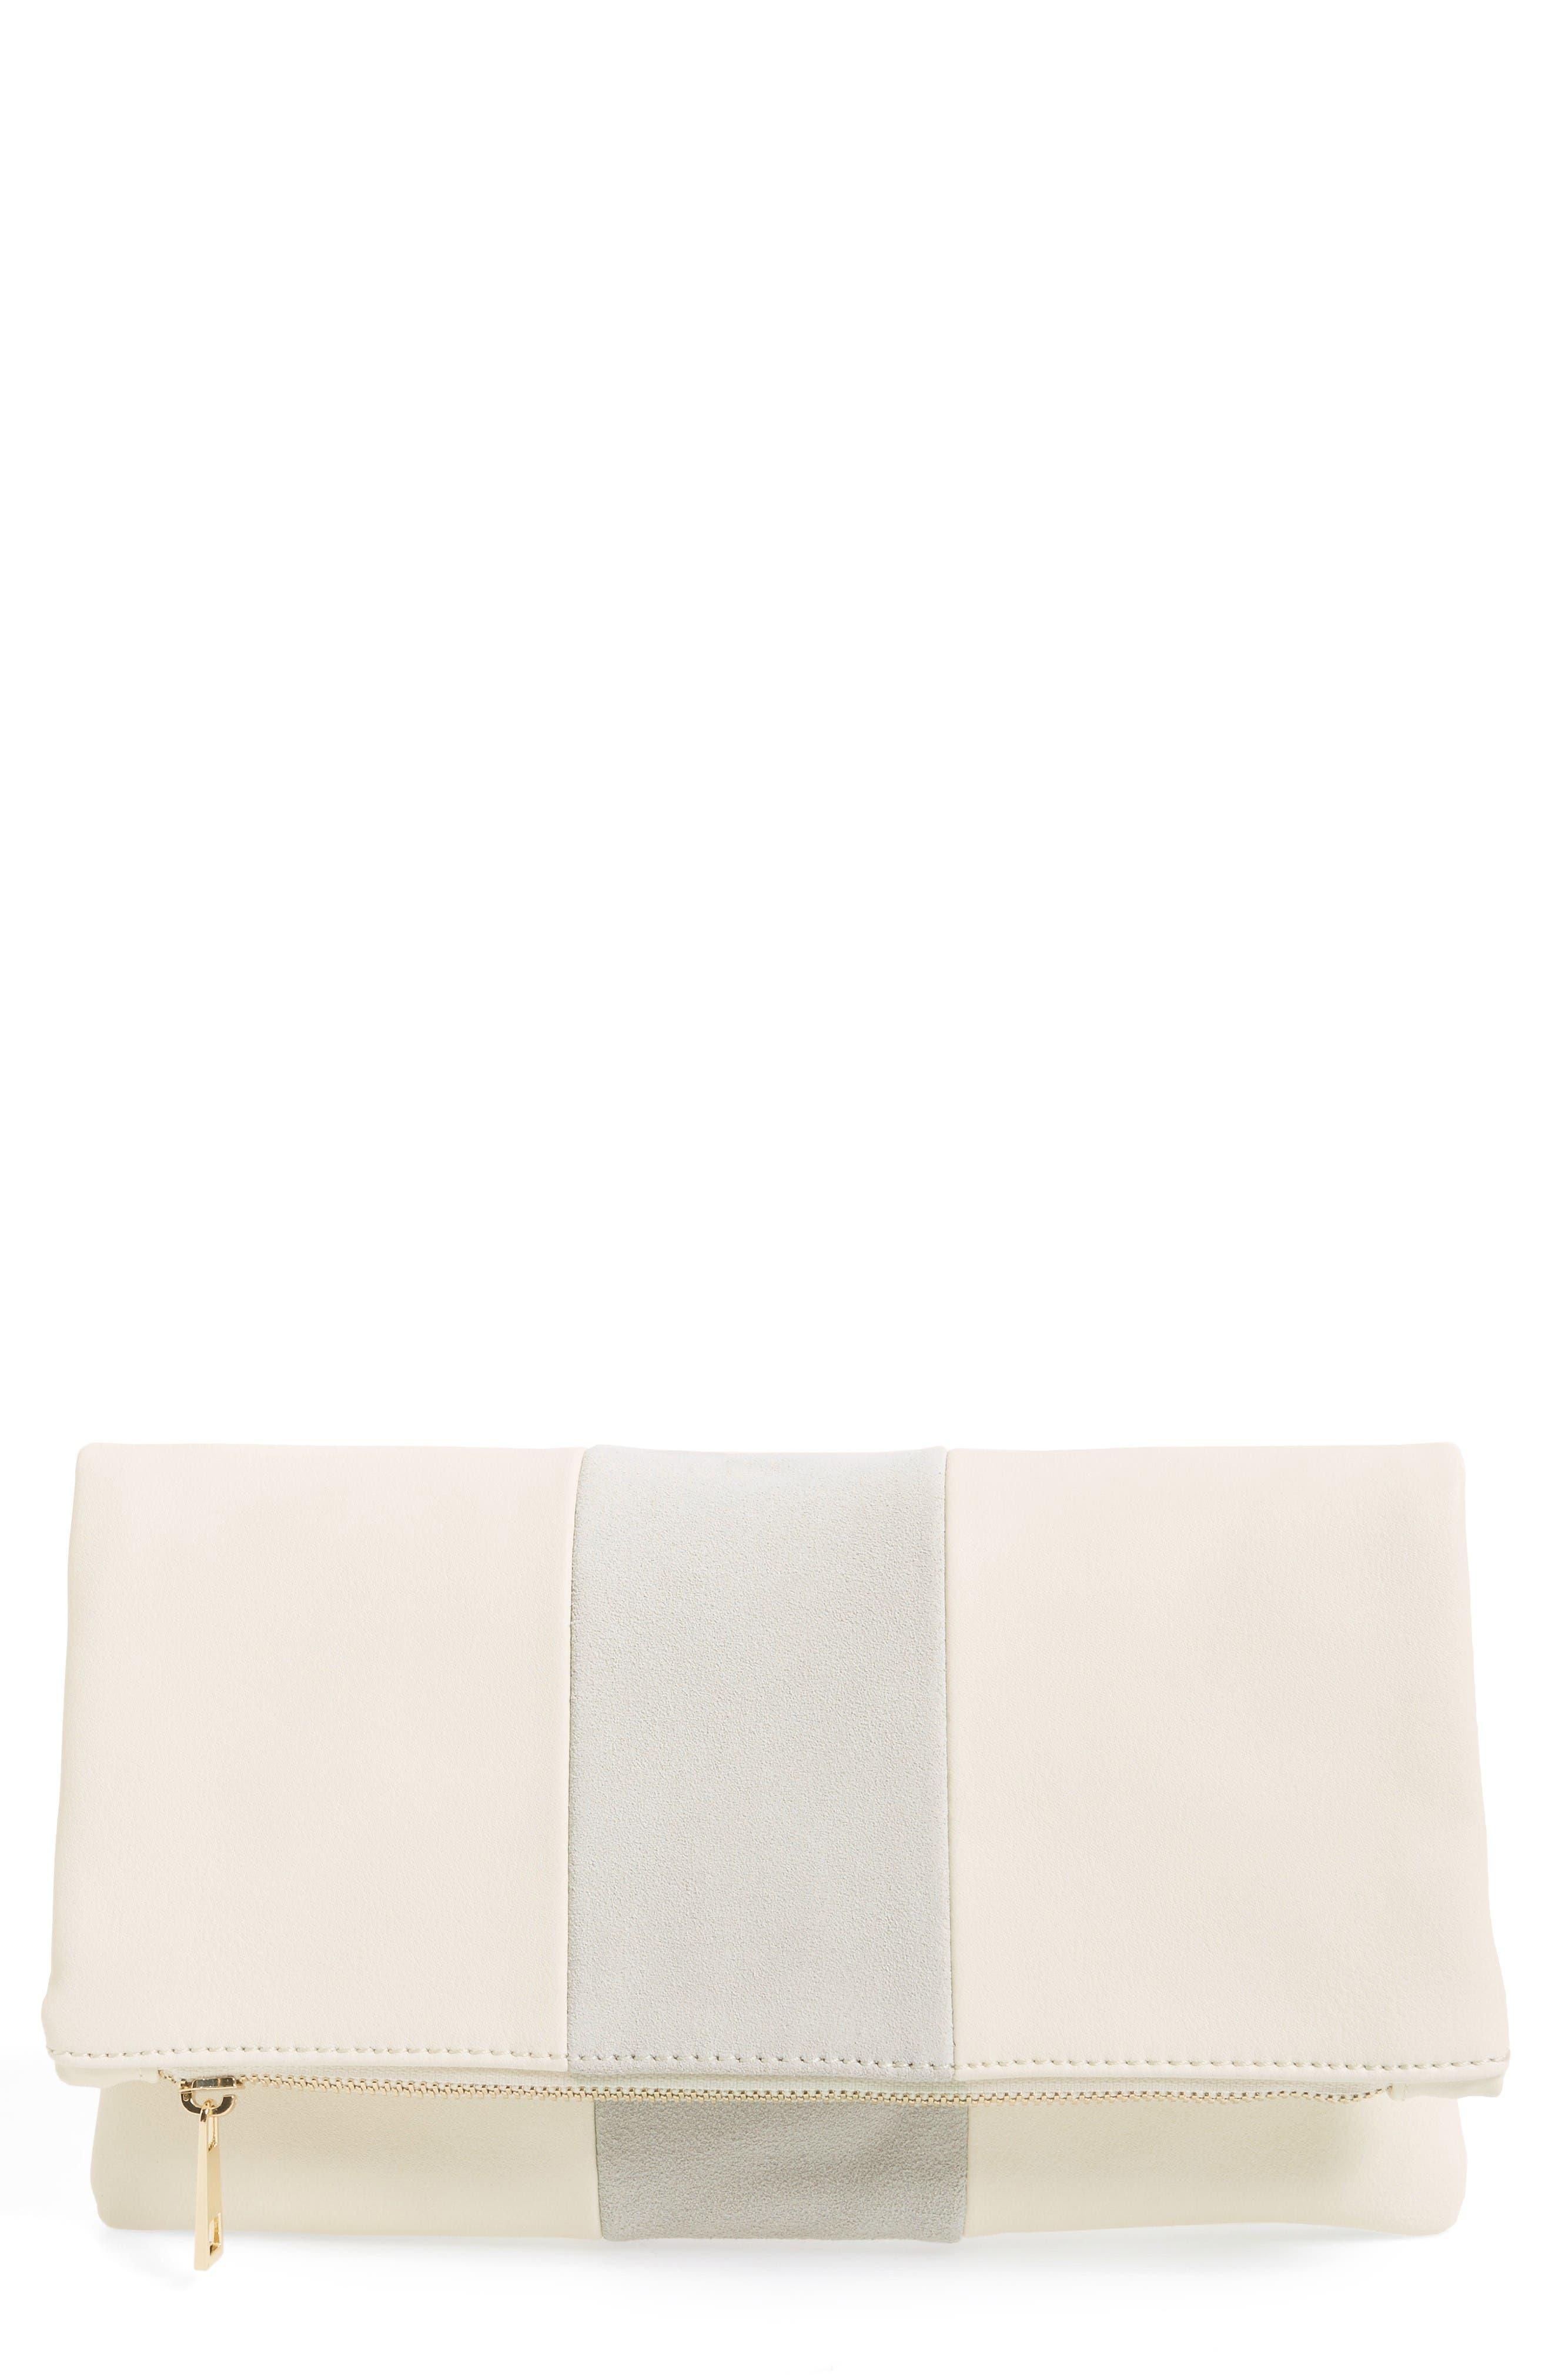 Alternate Image 1 Selected - BP. Tonal Stripe Foldover Clutch